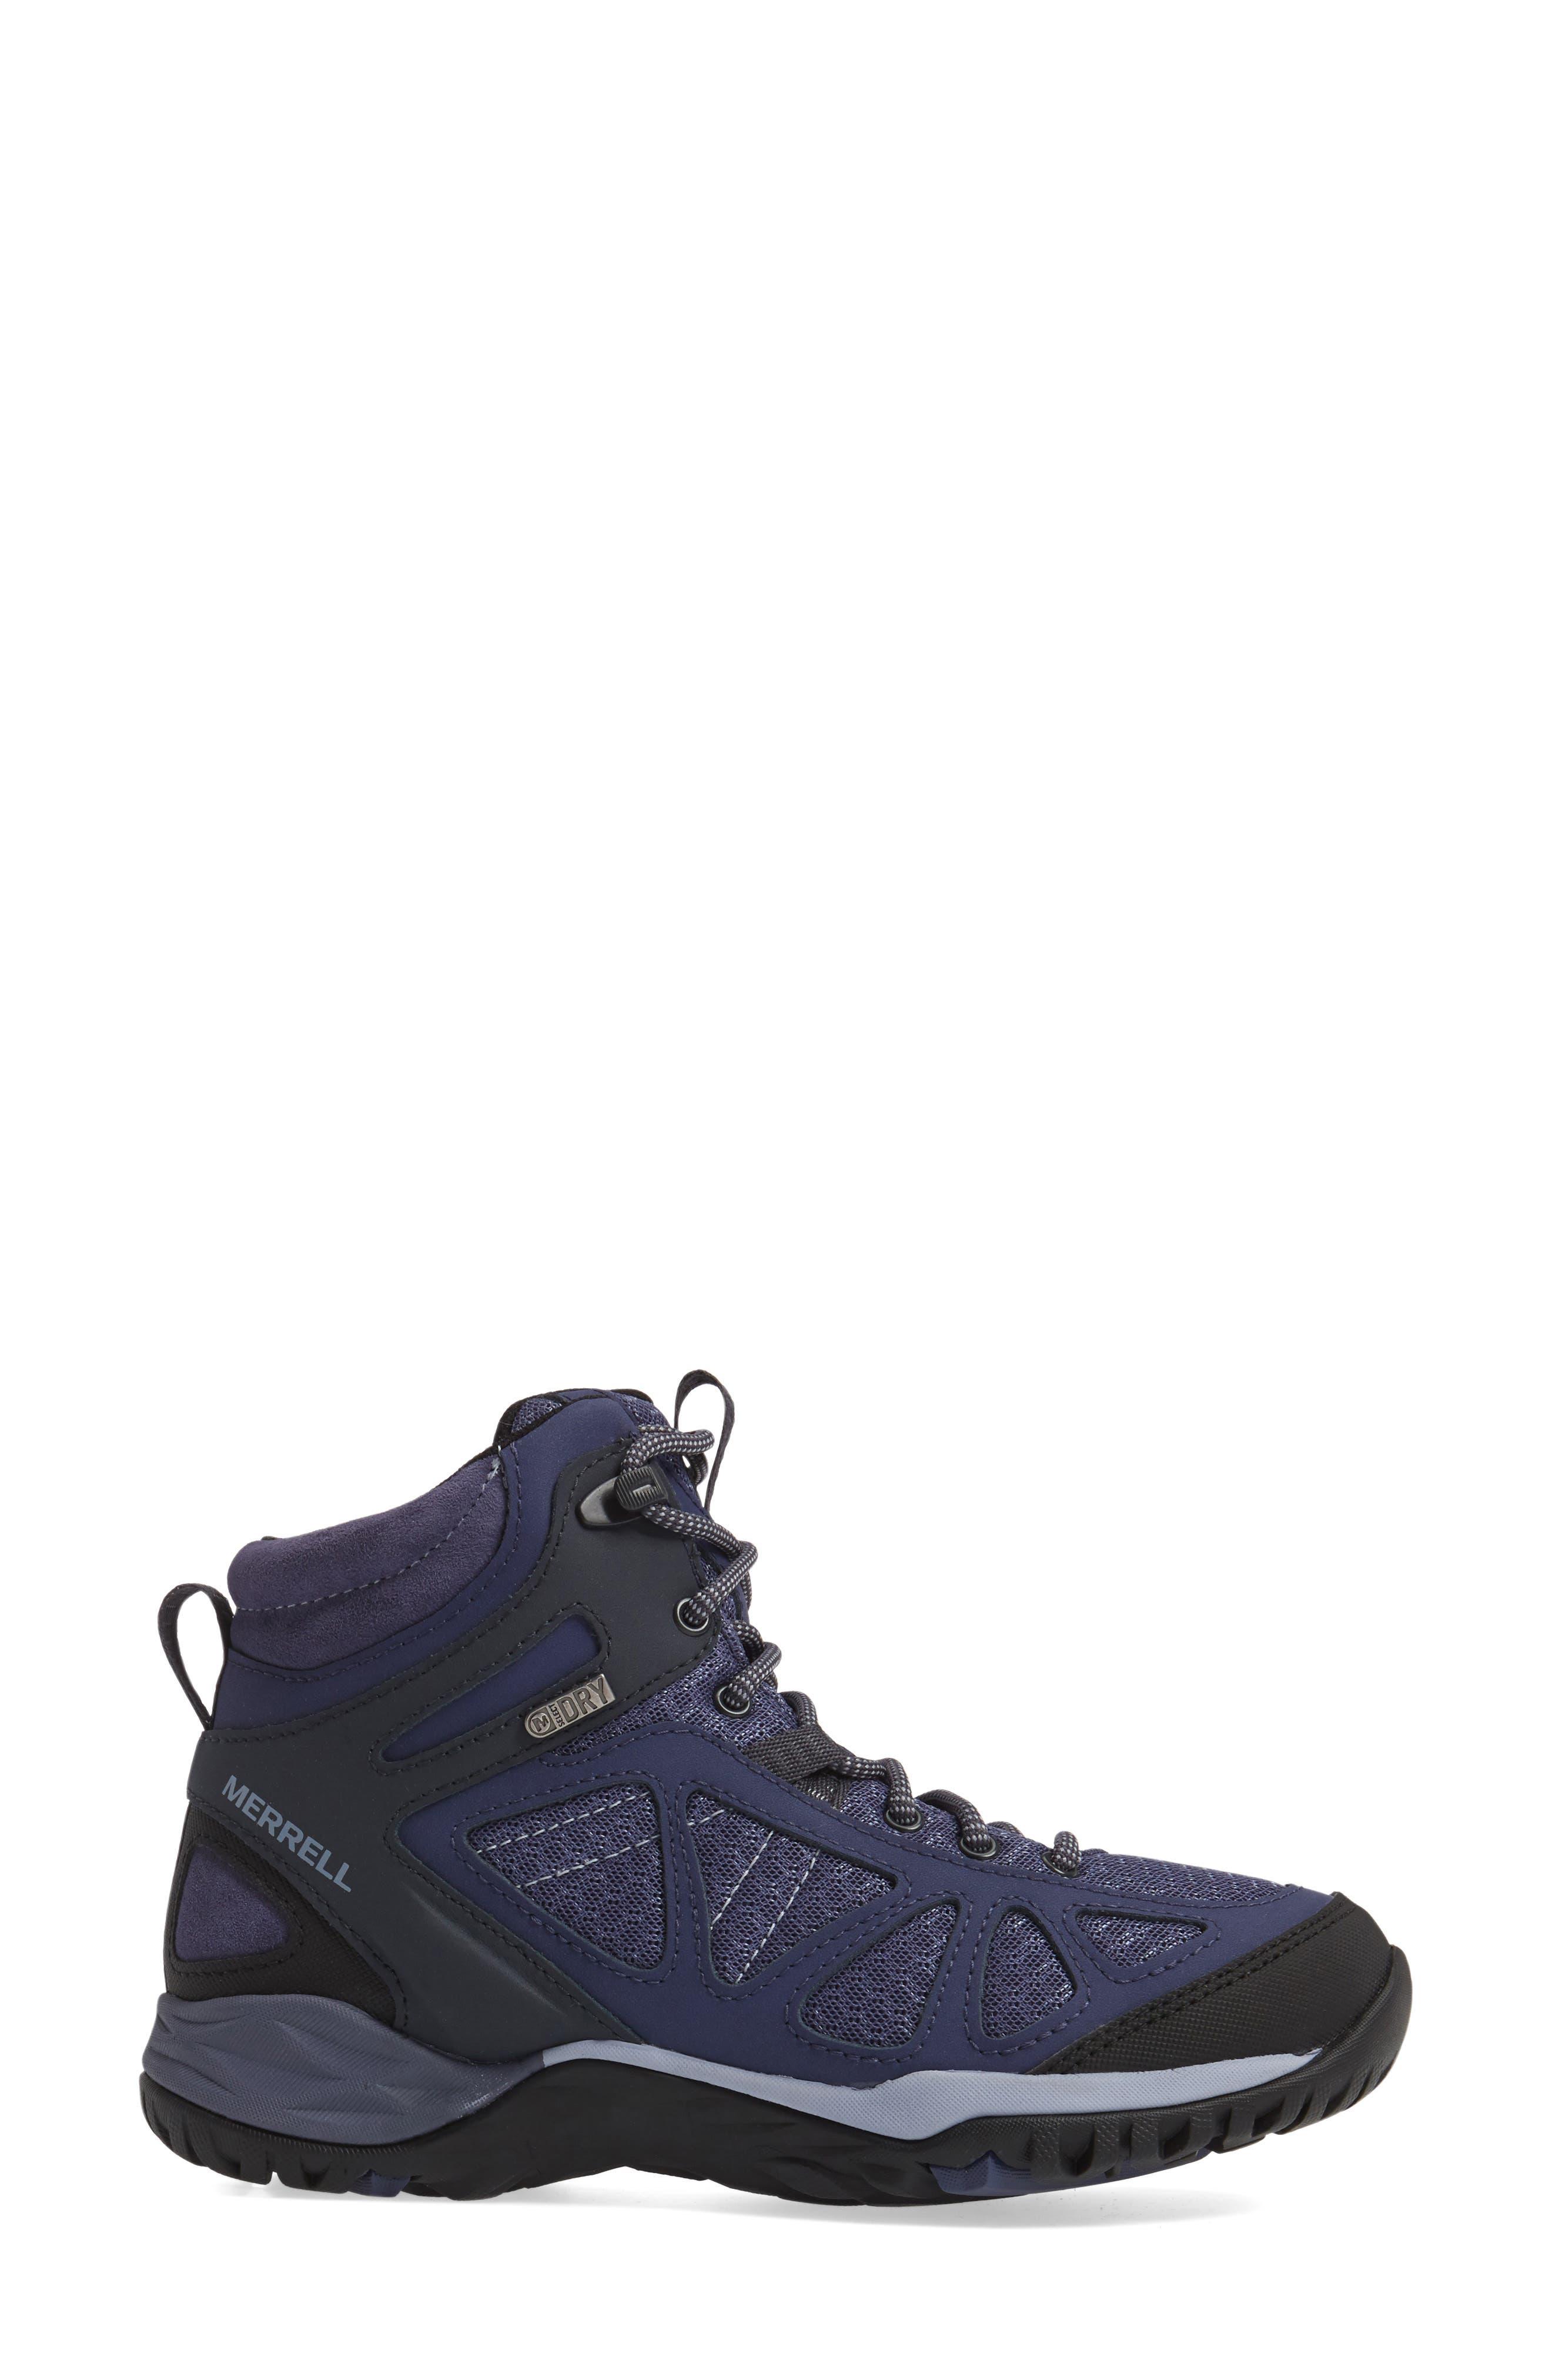 Siren Sport Q2 Waterproof Mid Top Sneaker,                             Alternate thumbnail 3, color,                             Crown Blue Nubuck Leather